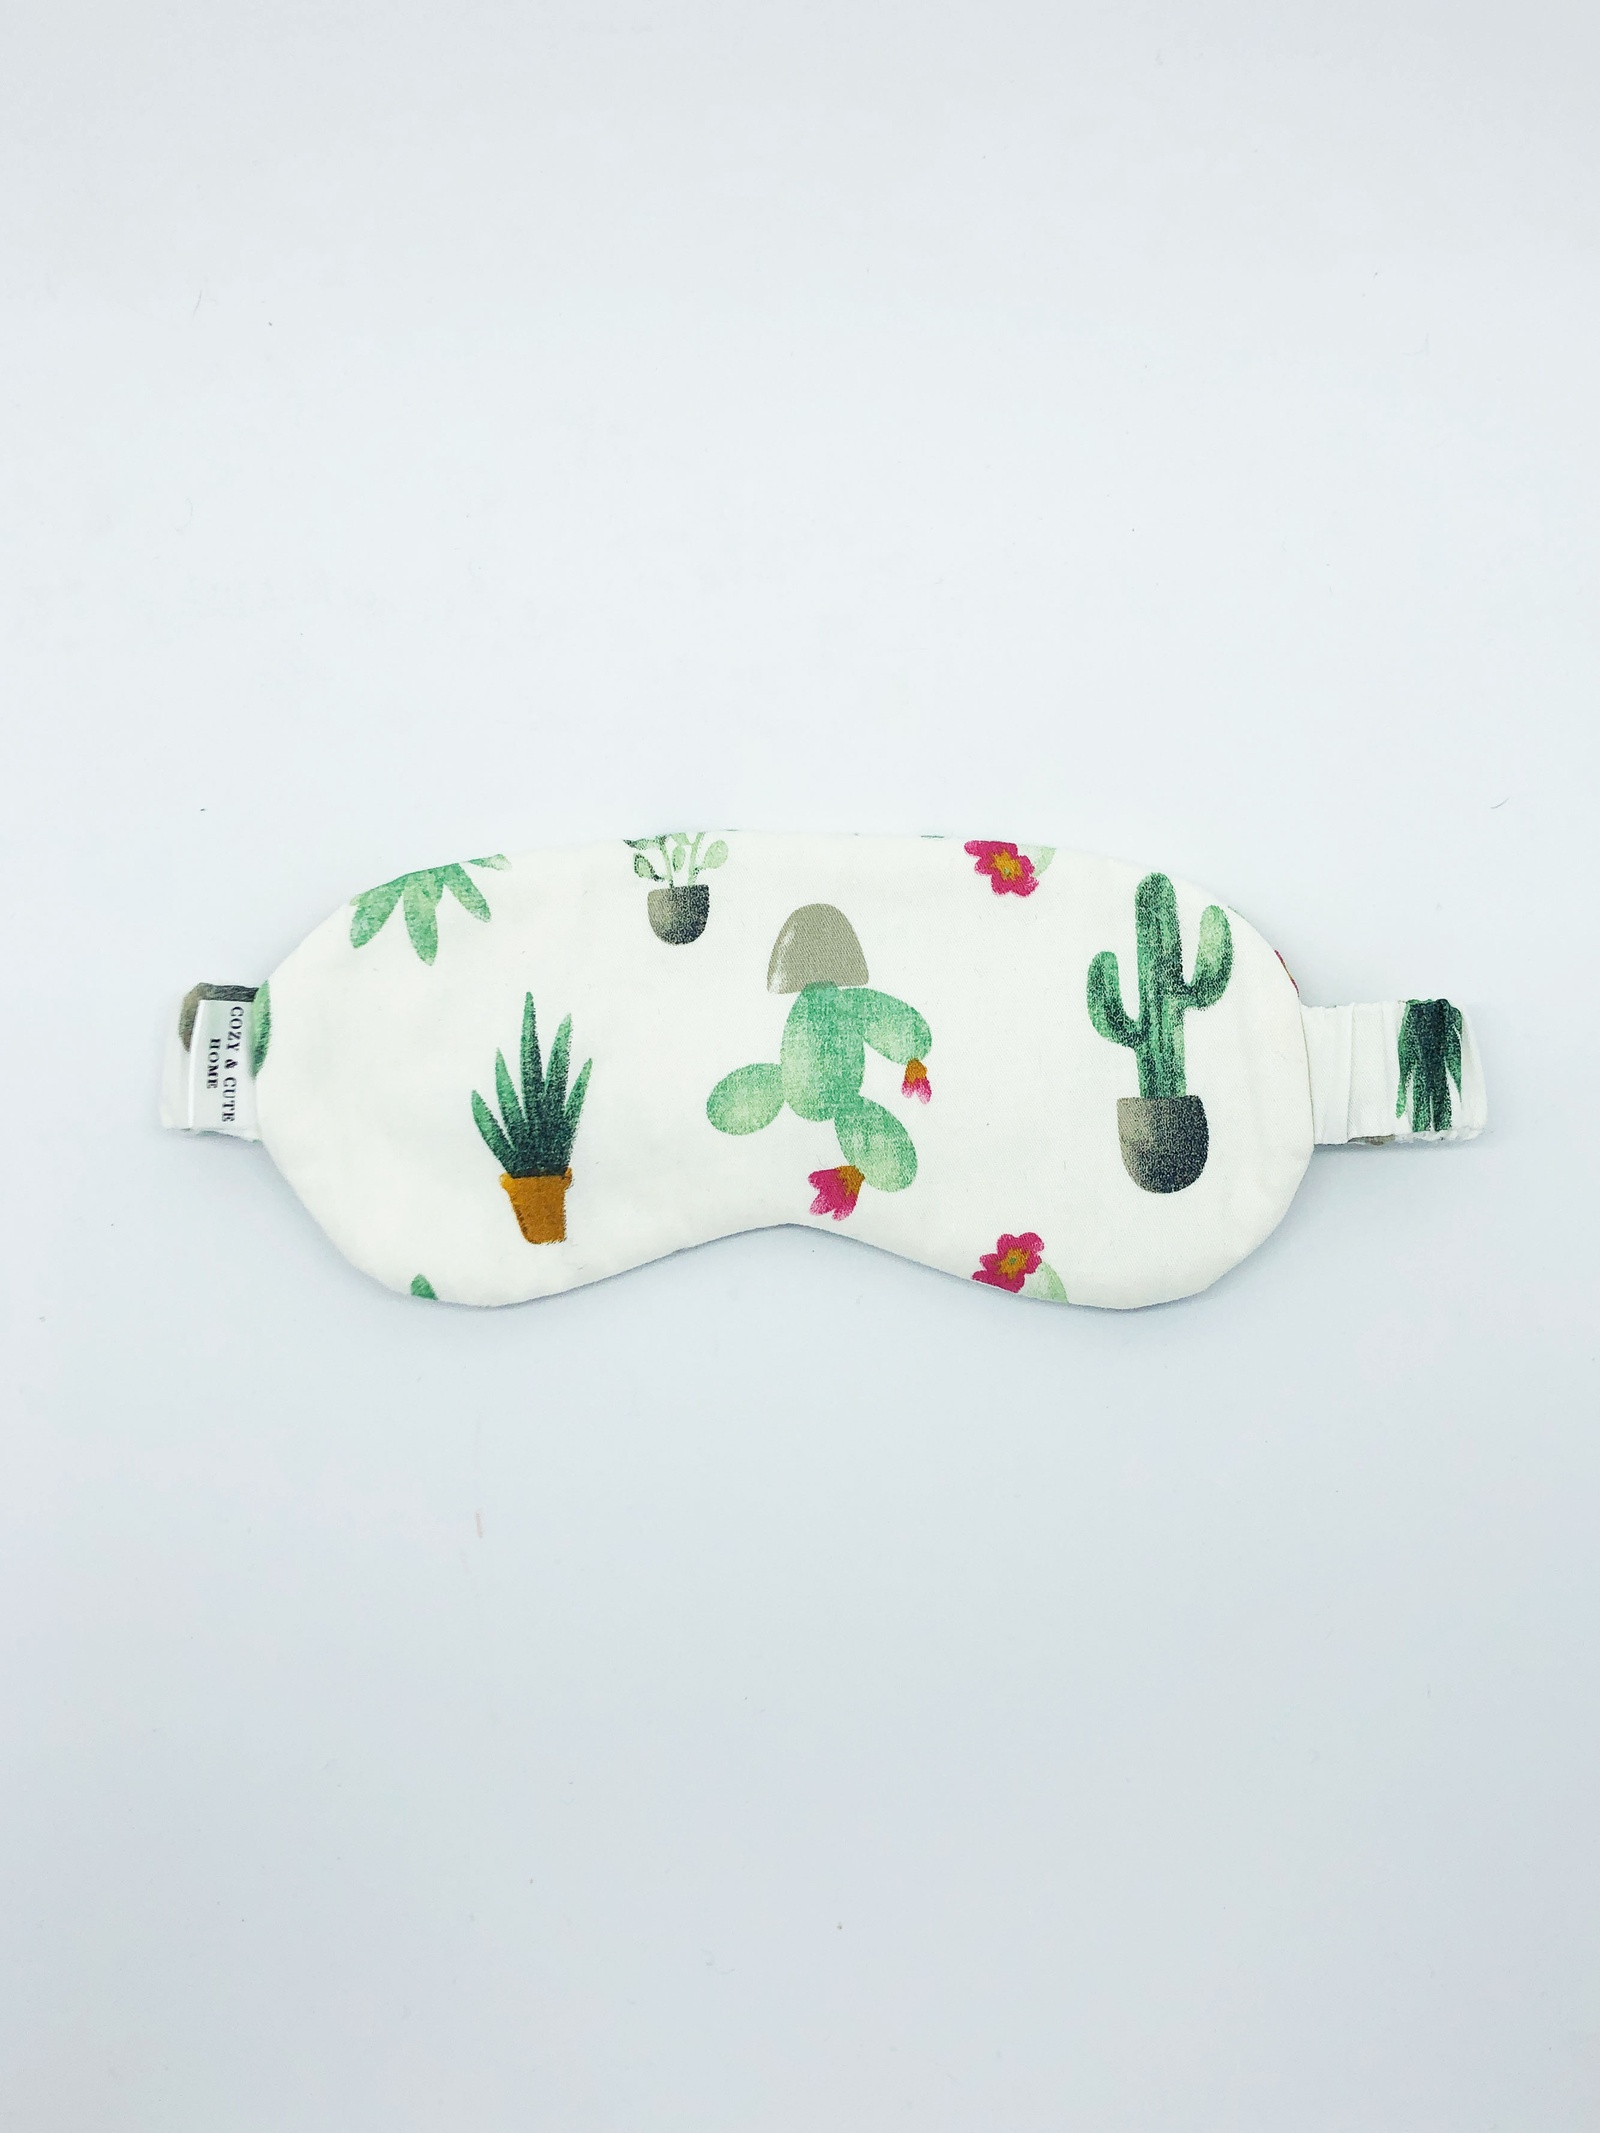 Маска для сна Cozy&Cute Home Кактусы, белый, зеленый